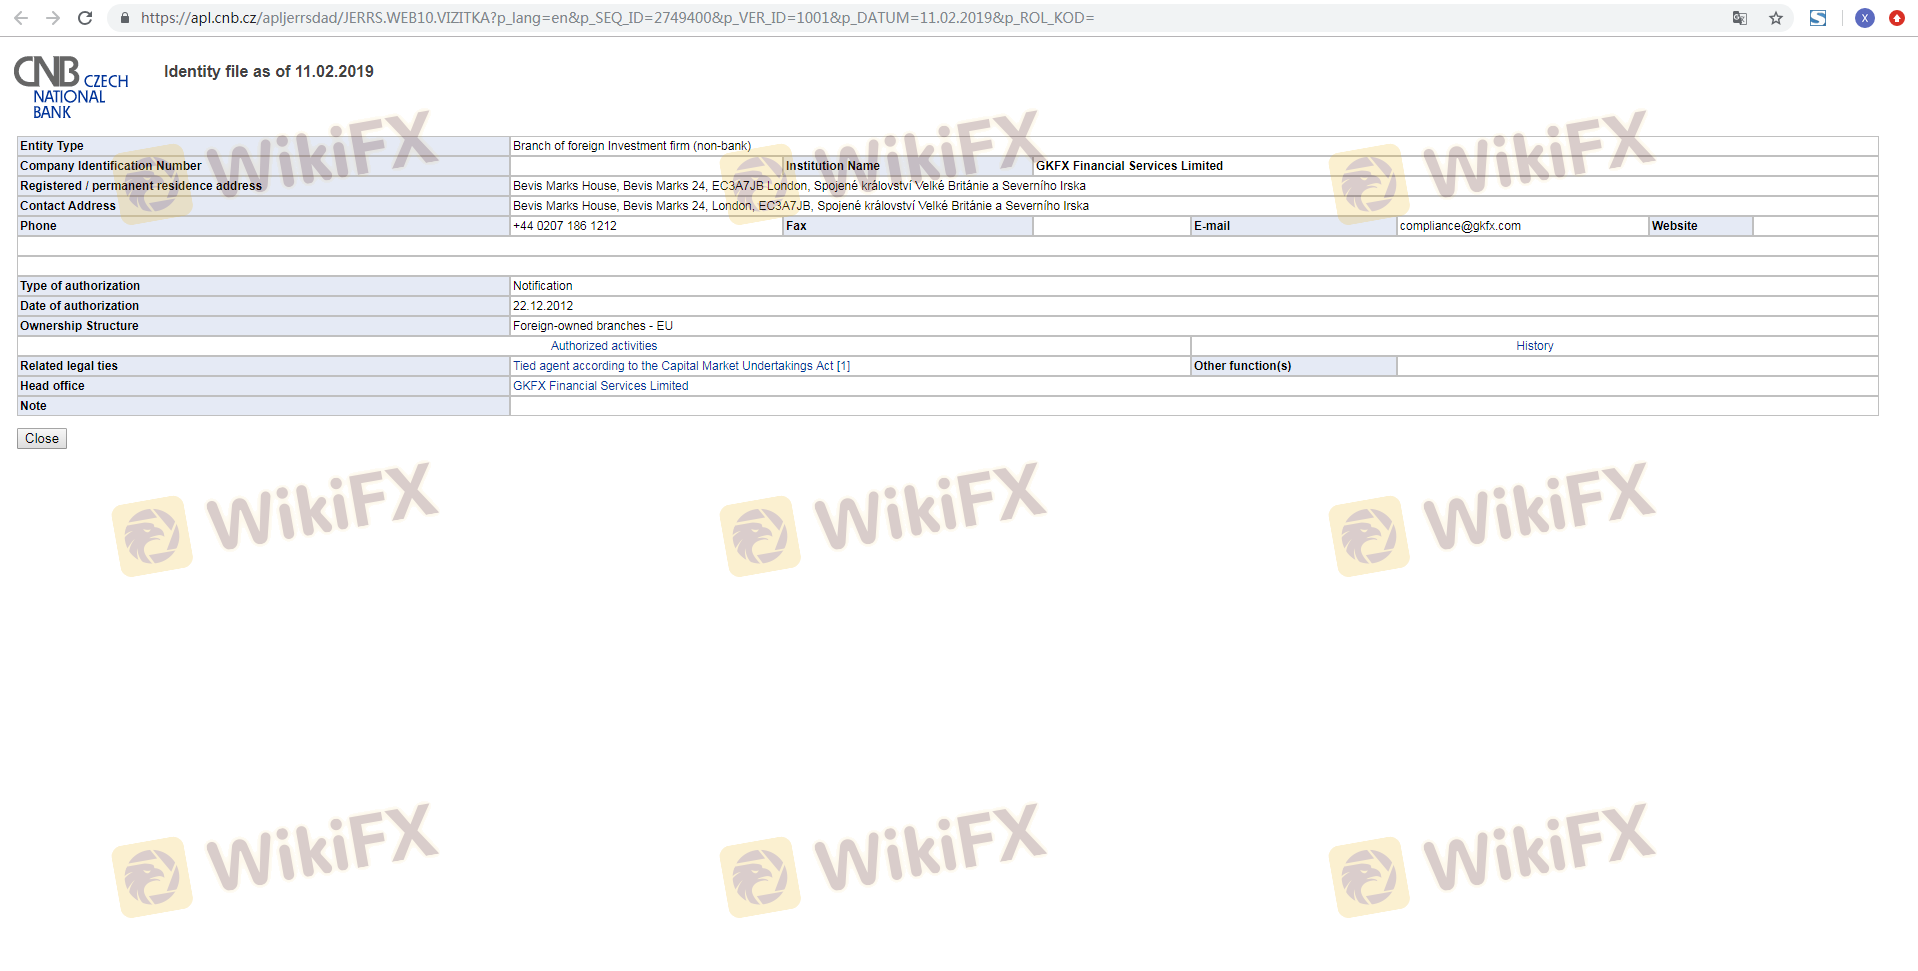 gkfx spread betting leverage wiki